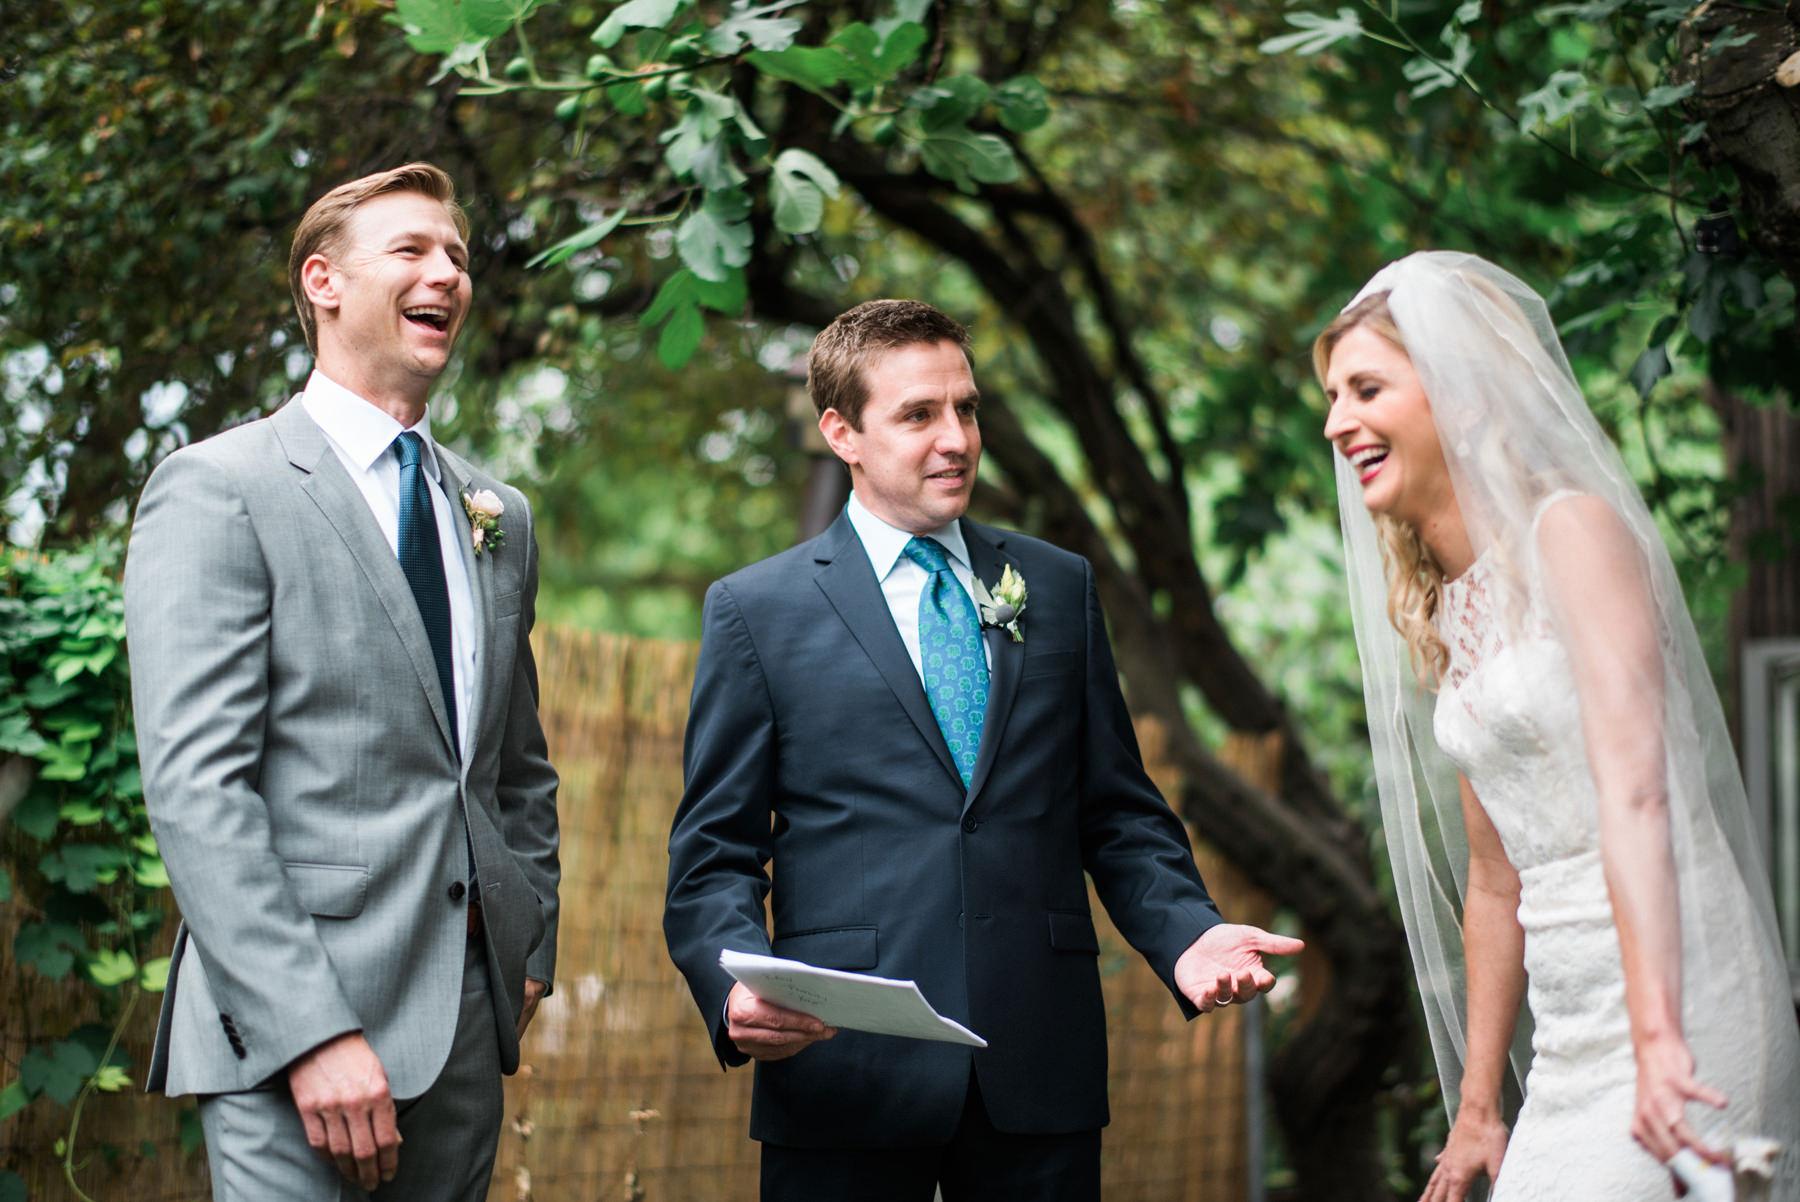 205-outdoor-wedding-ceremony-at-the-corson-building.jpg